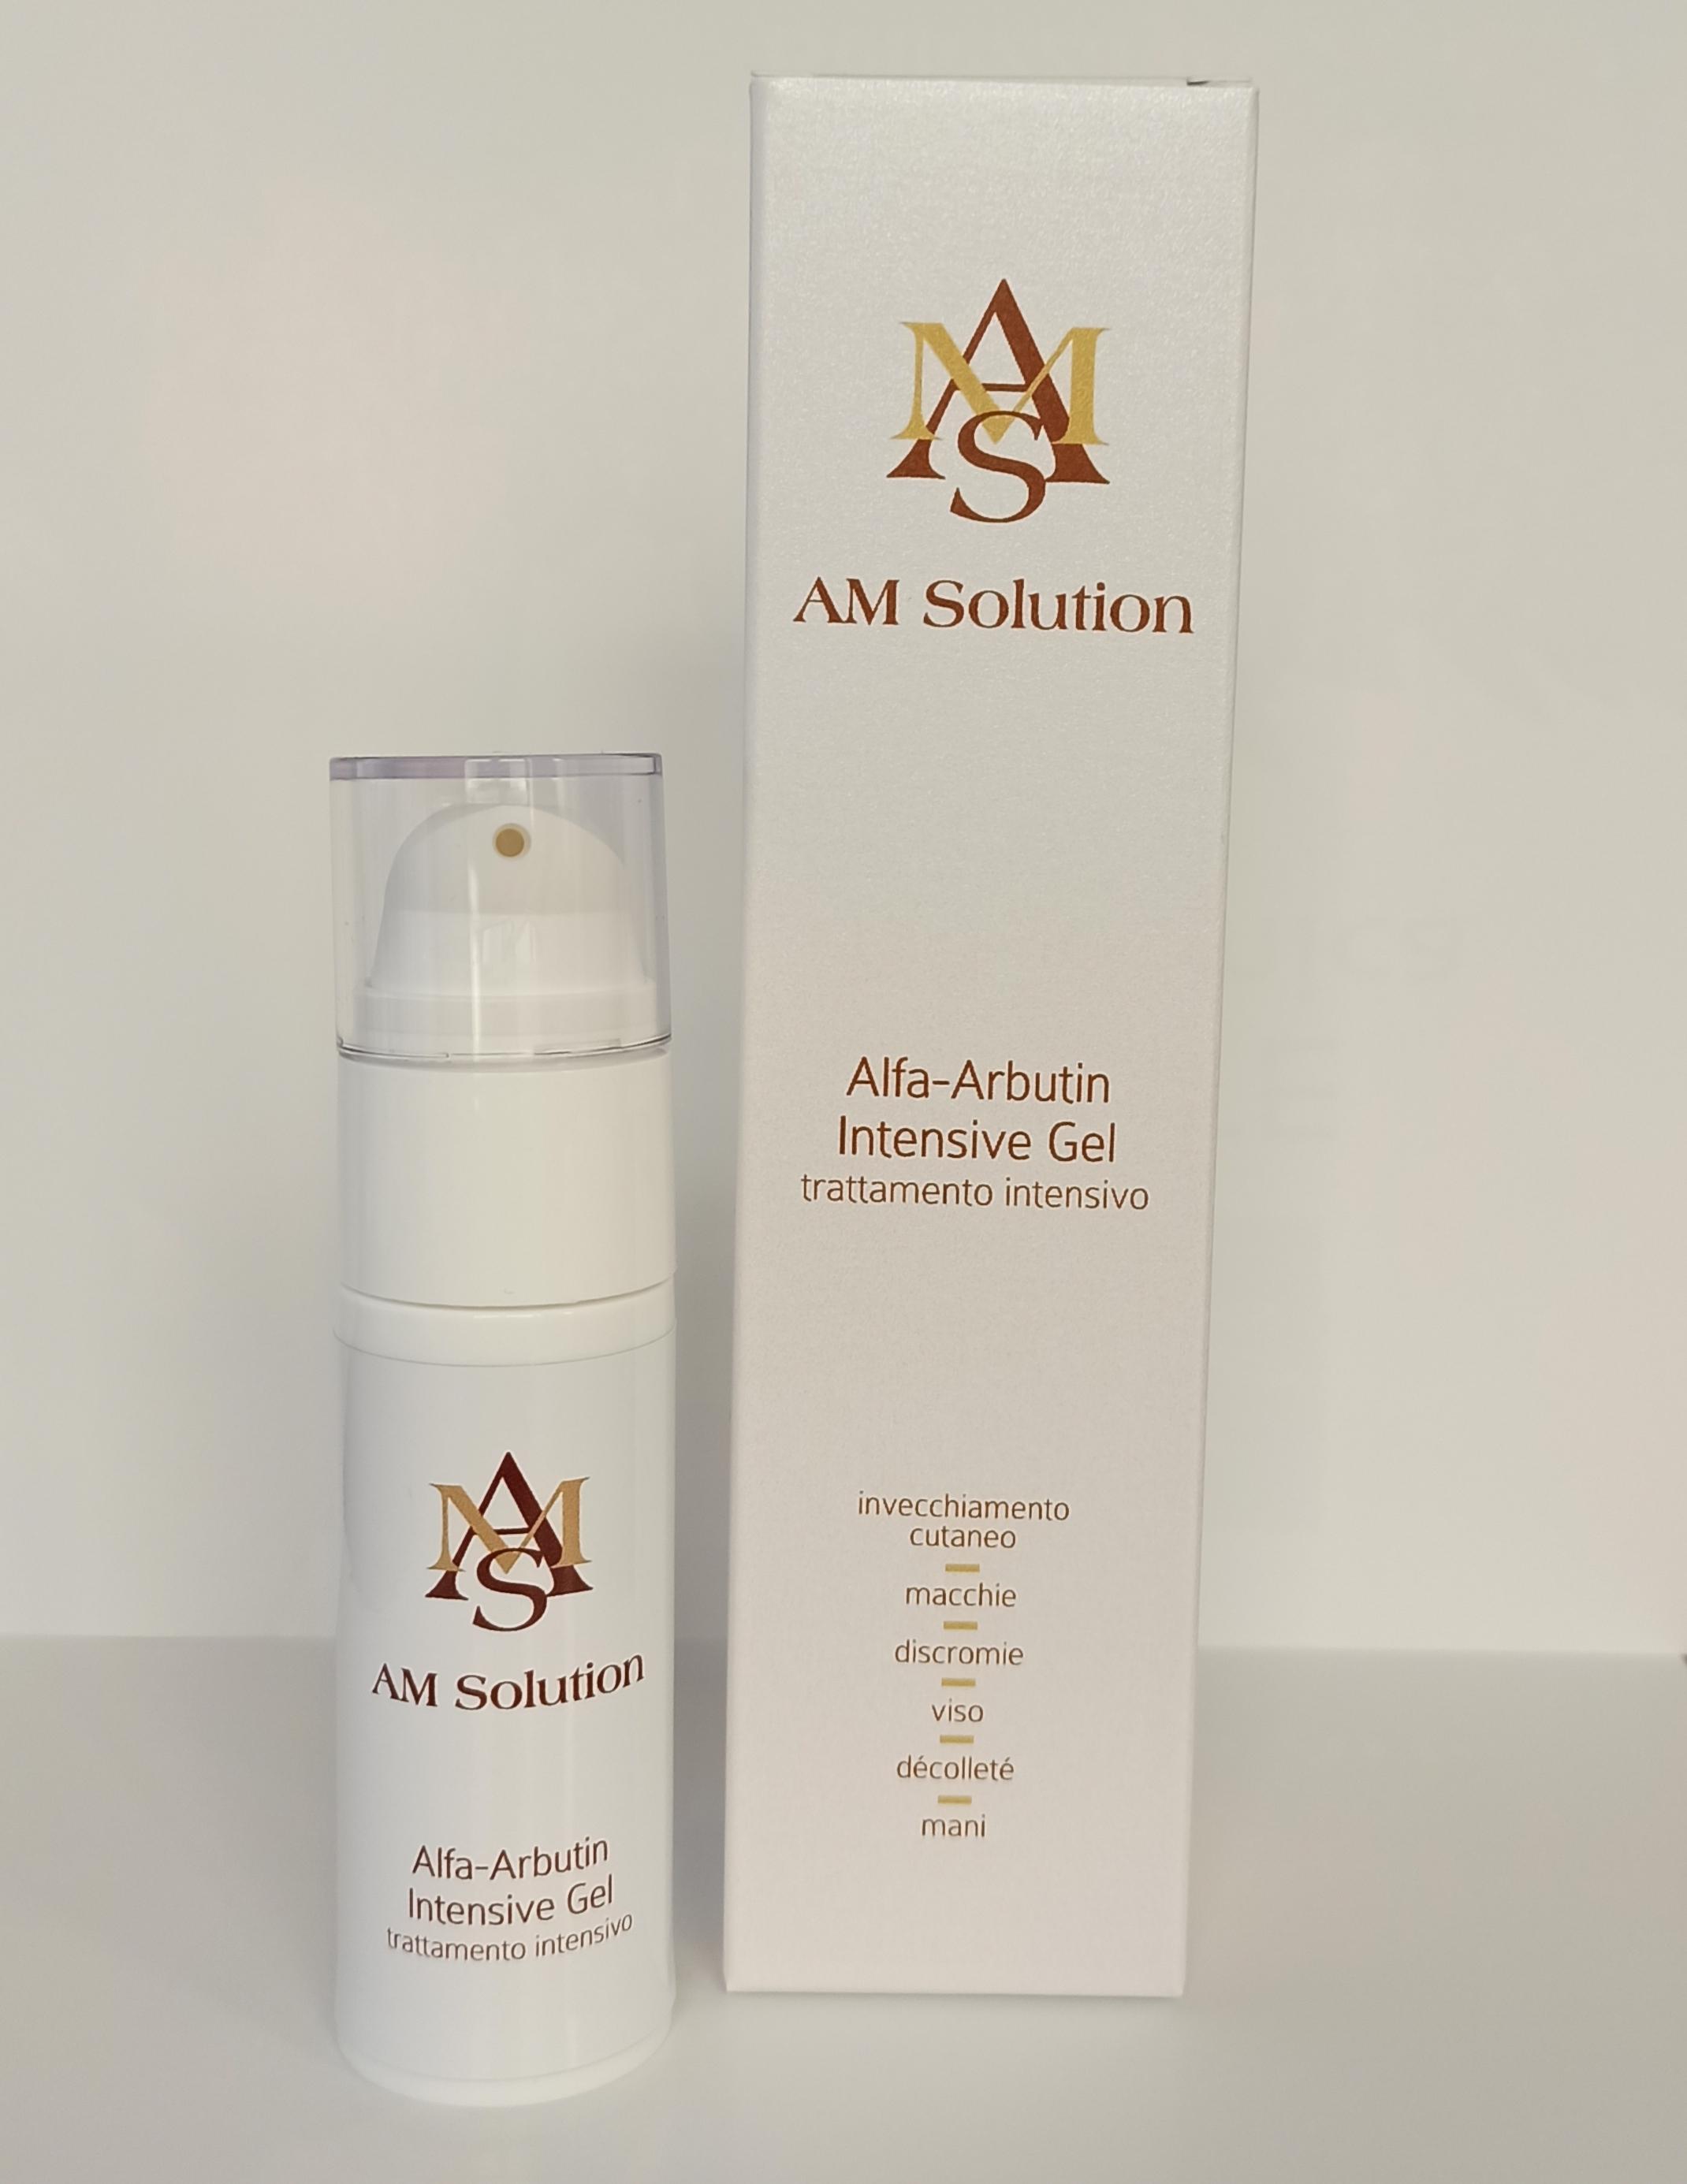 Alfa-Arbutin Intensive gel    flacone airless 30 ml